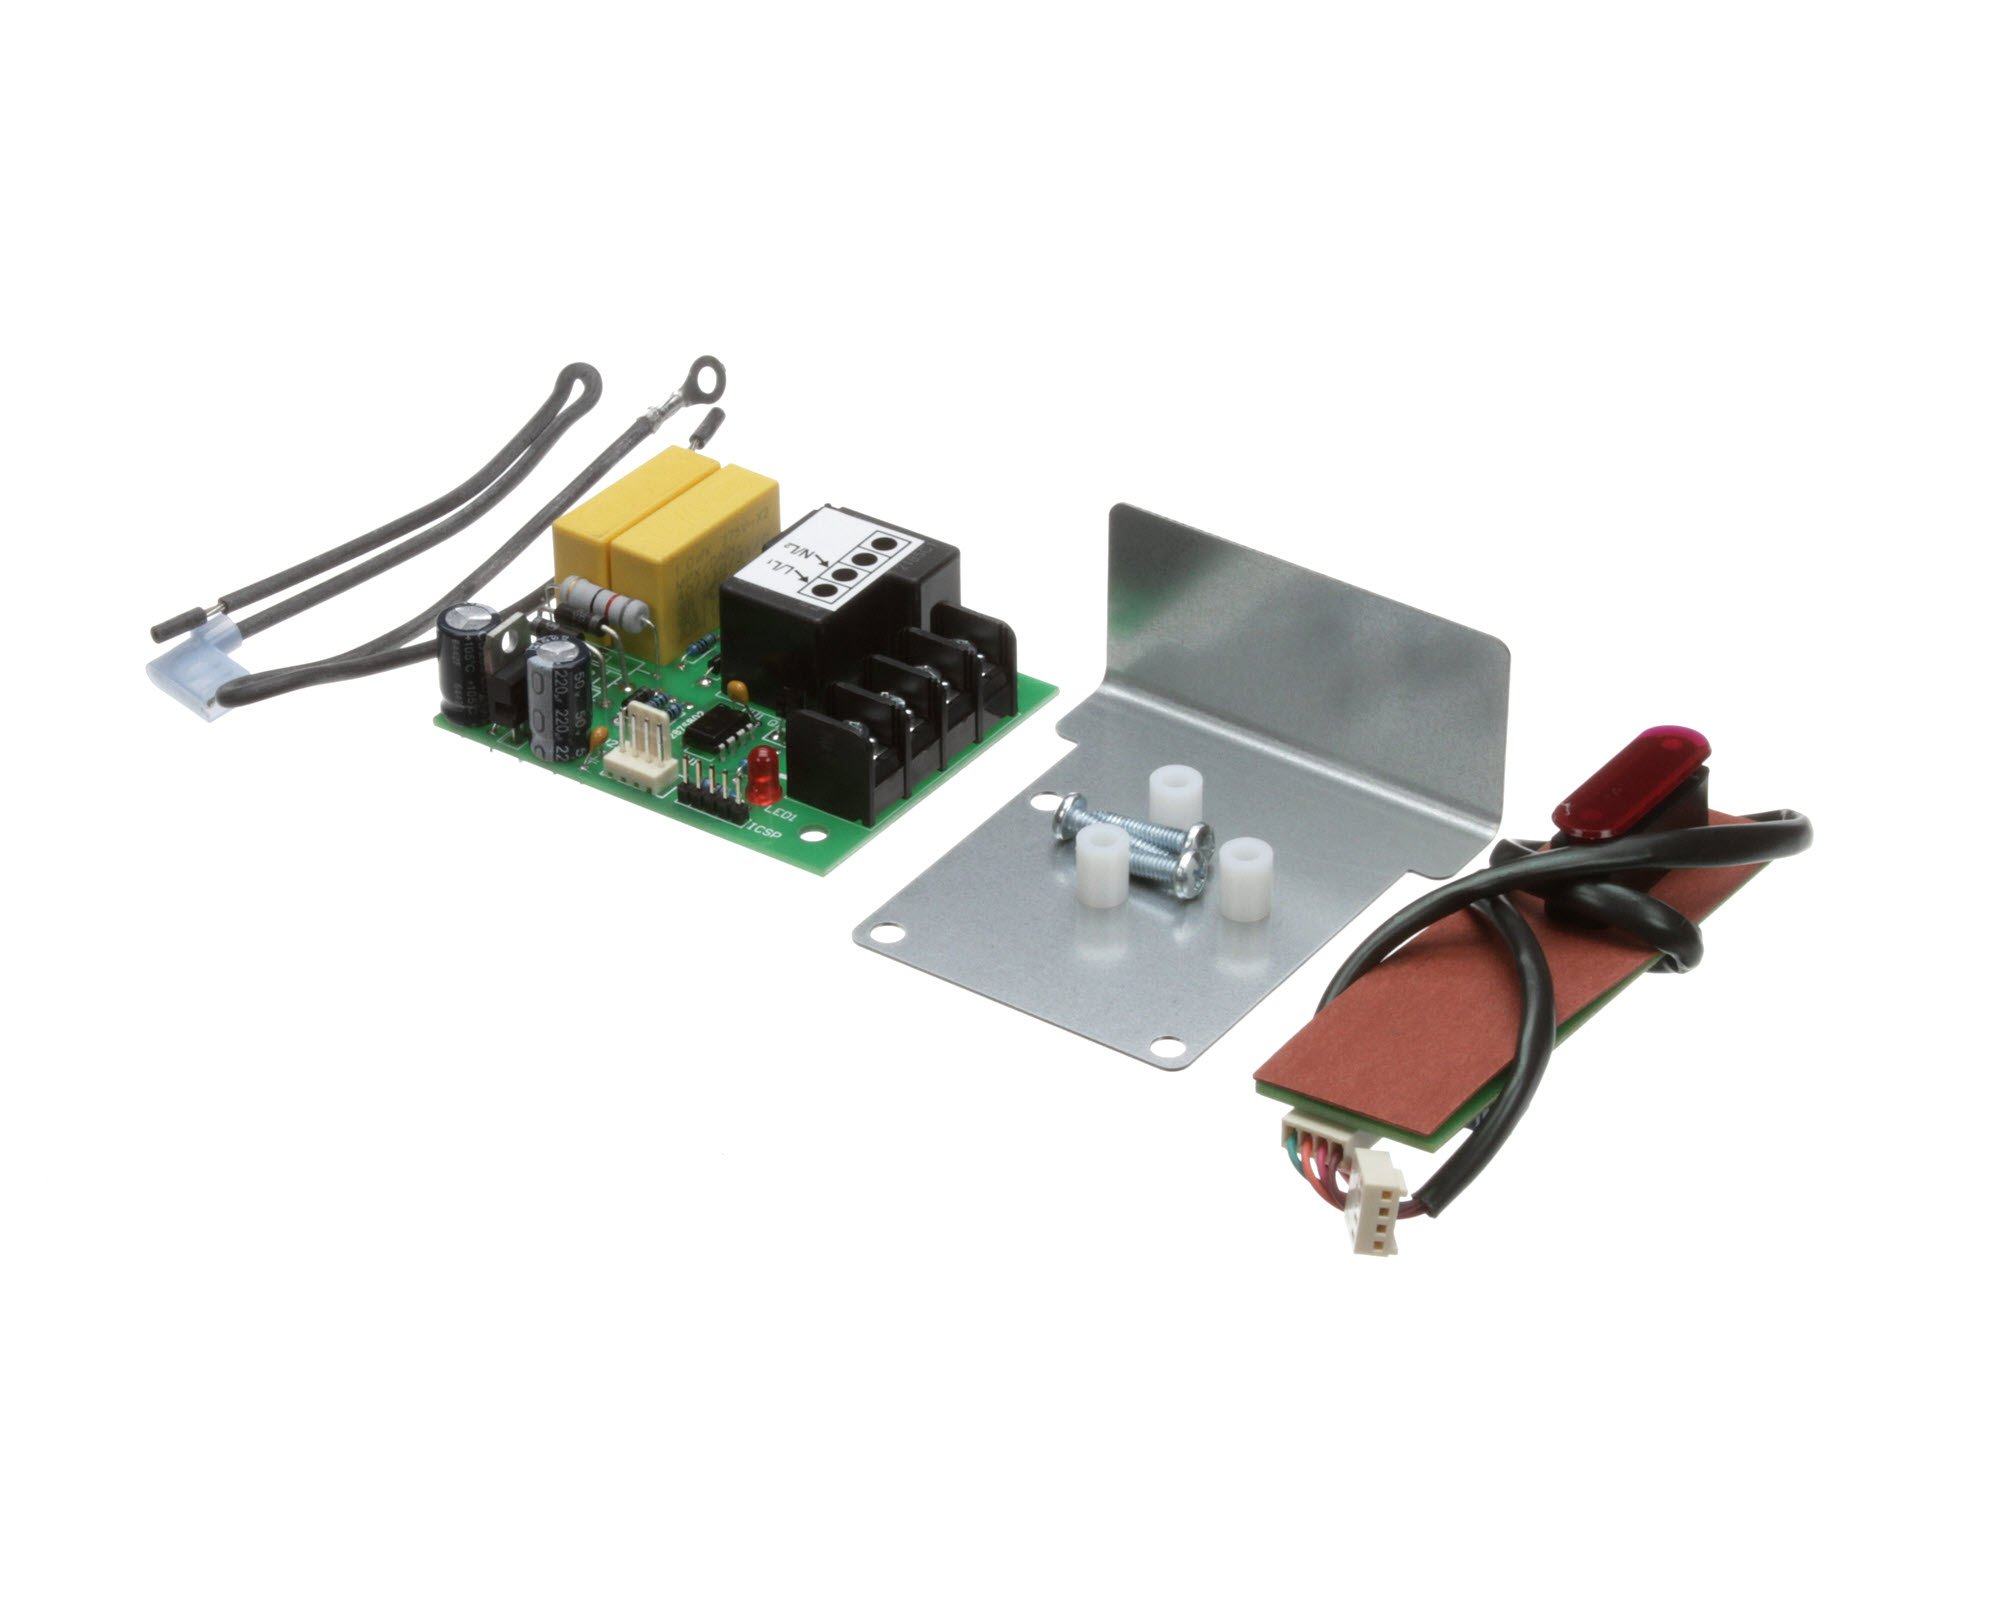 World Dryer 16-10391KN4 Sensor Circuit Board Nova 4 by World Dryer